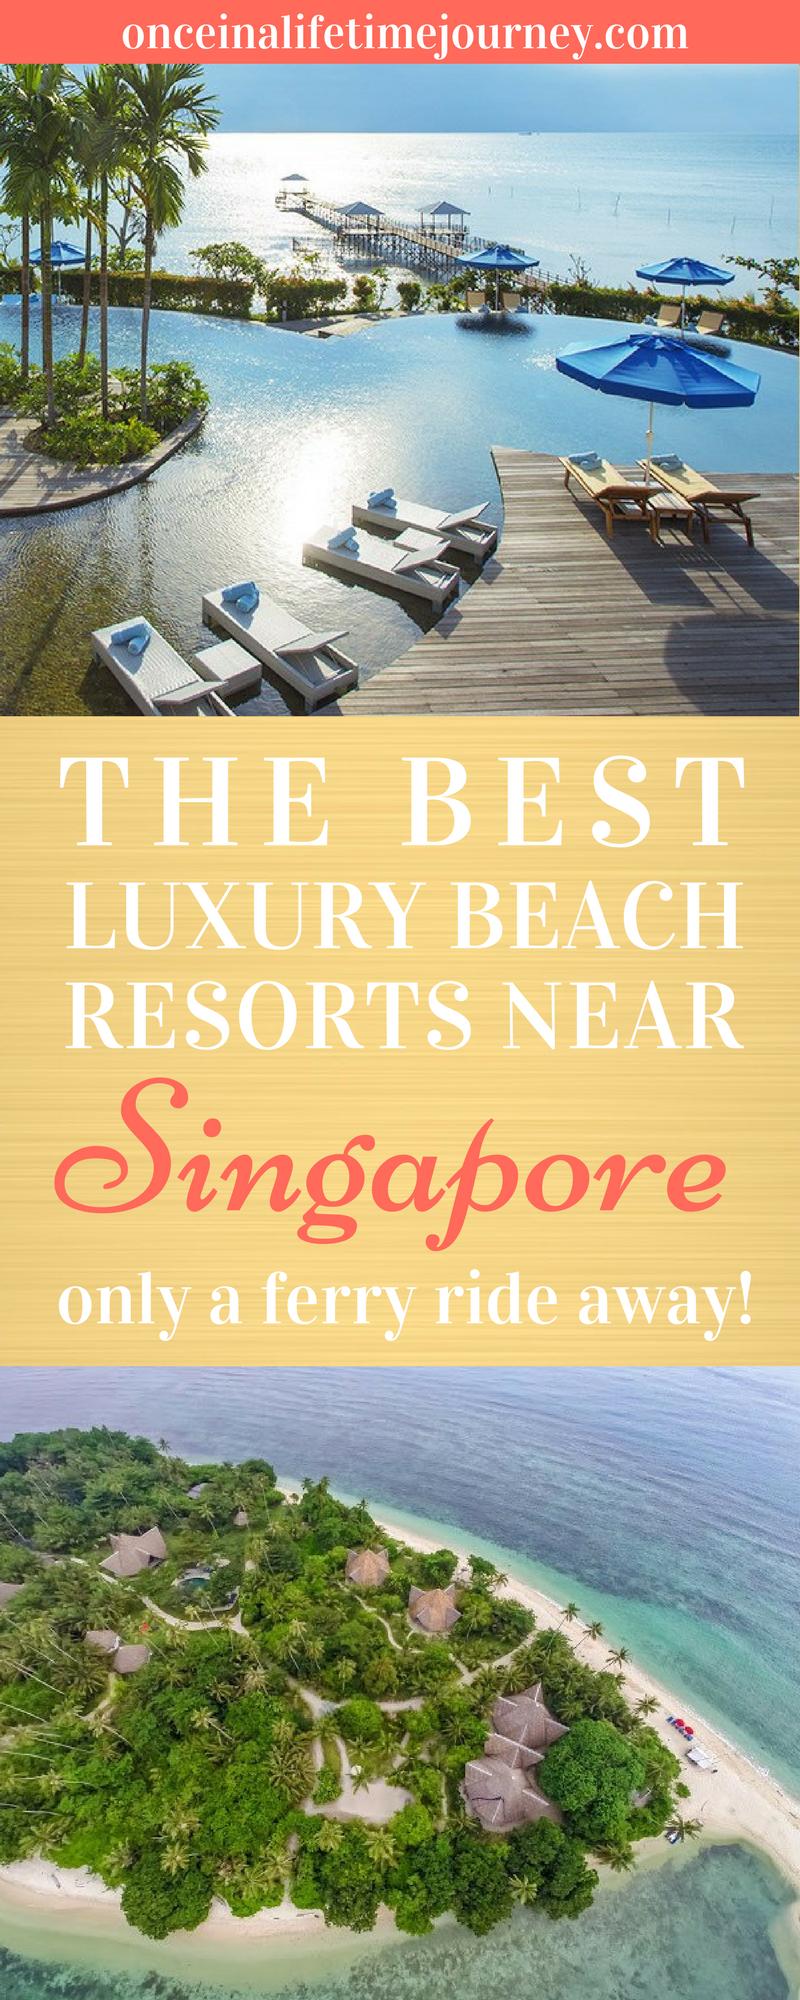 Best Resorts Near Singapore In Bintan And Batam Travel Destinations Asia Luxury Beach Resorts Asia Travel